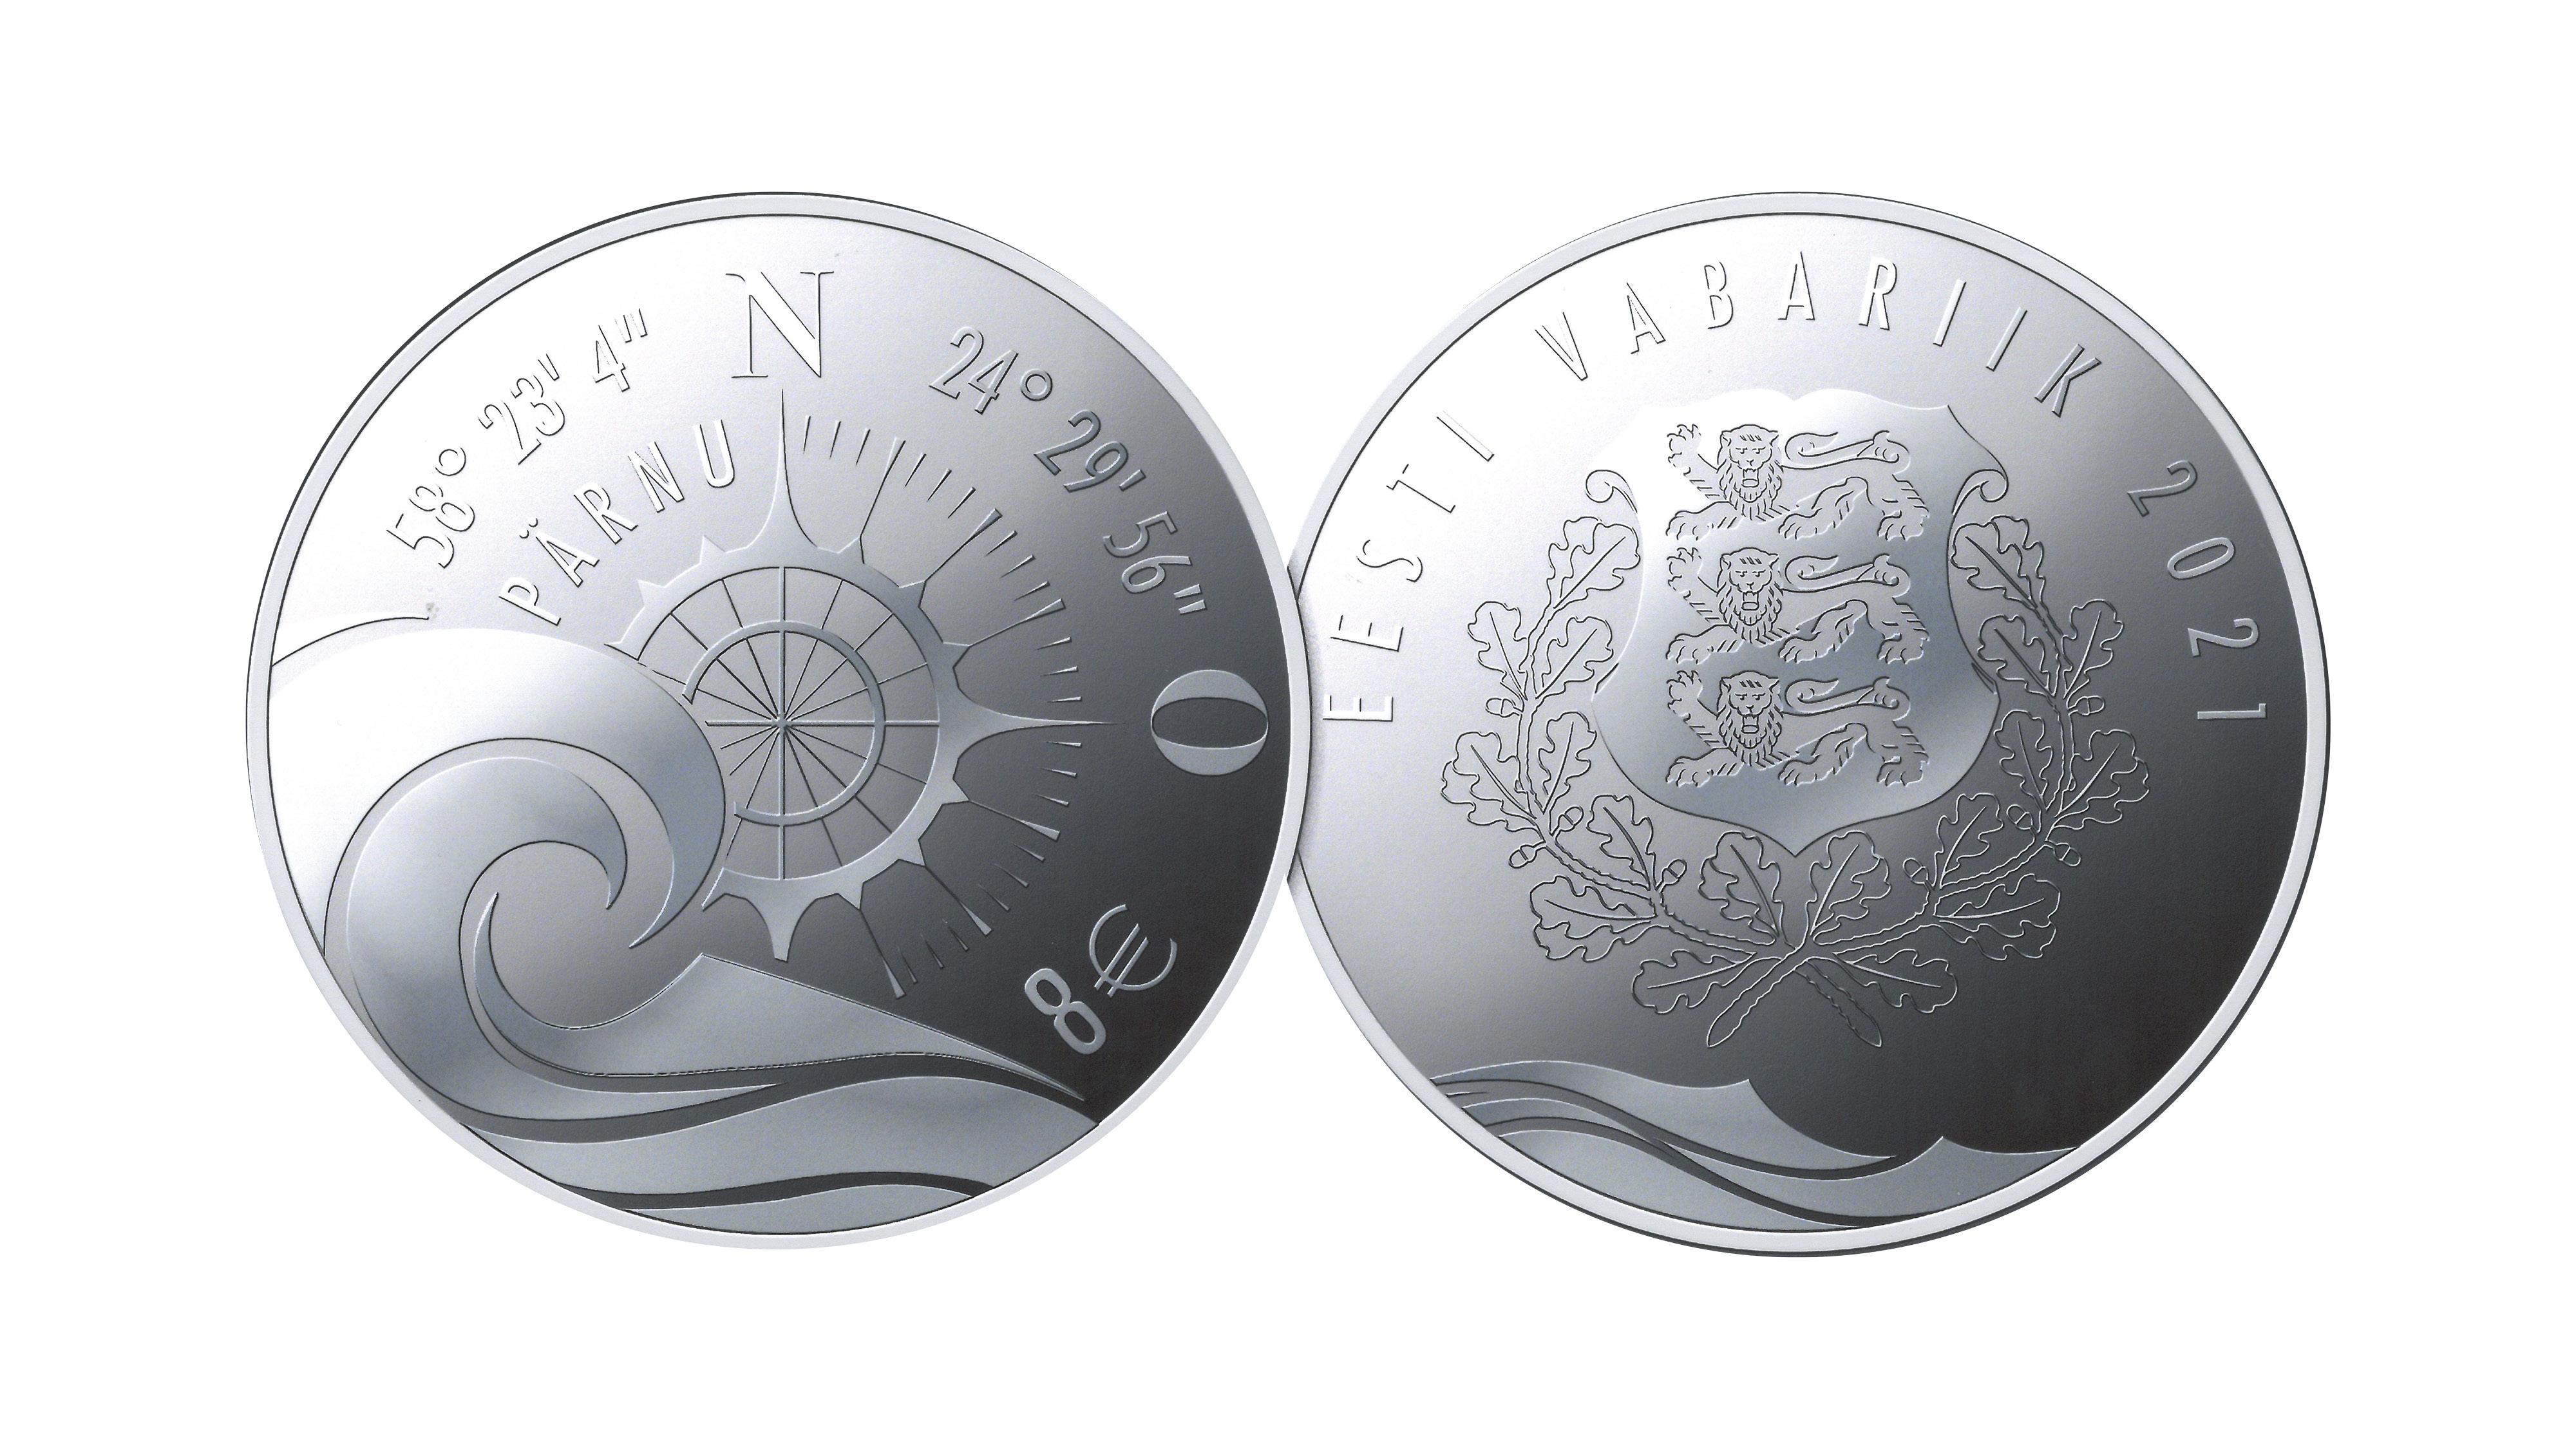 2021 estonian numismatic program